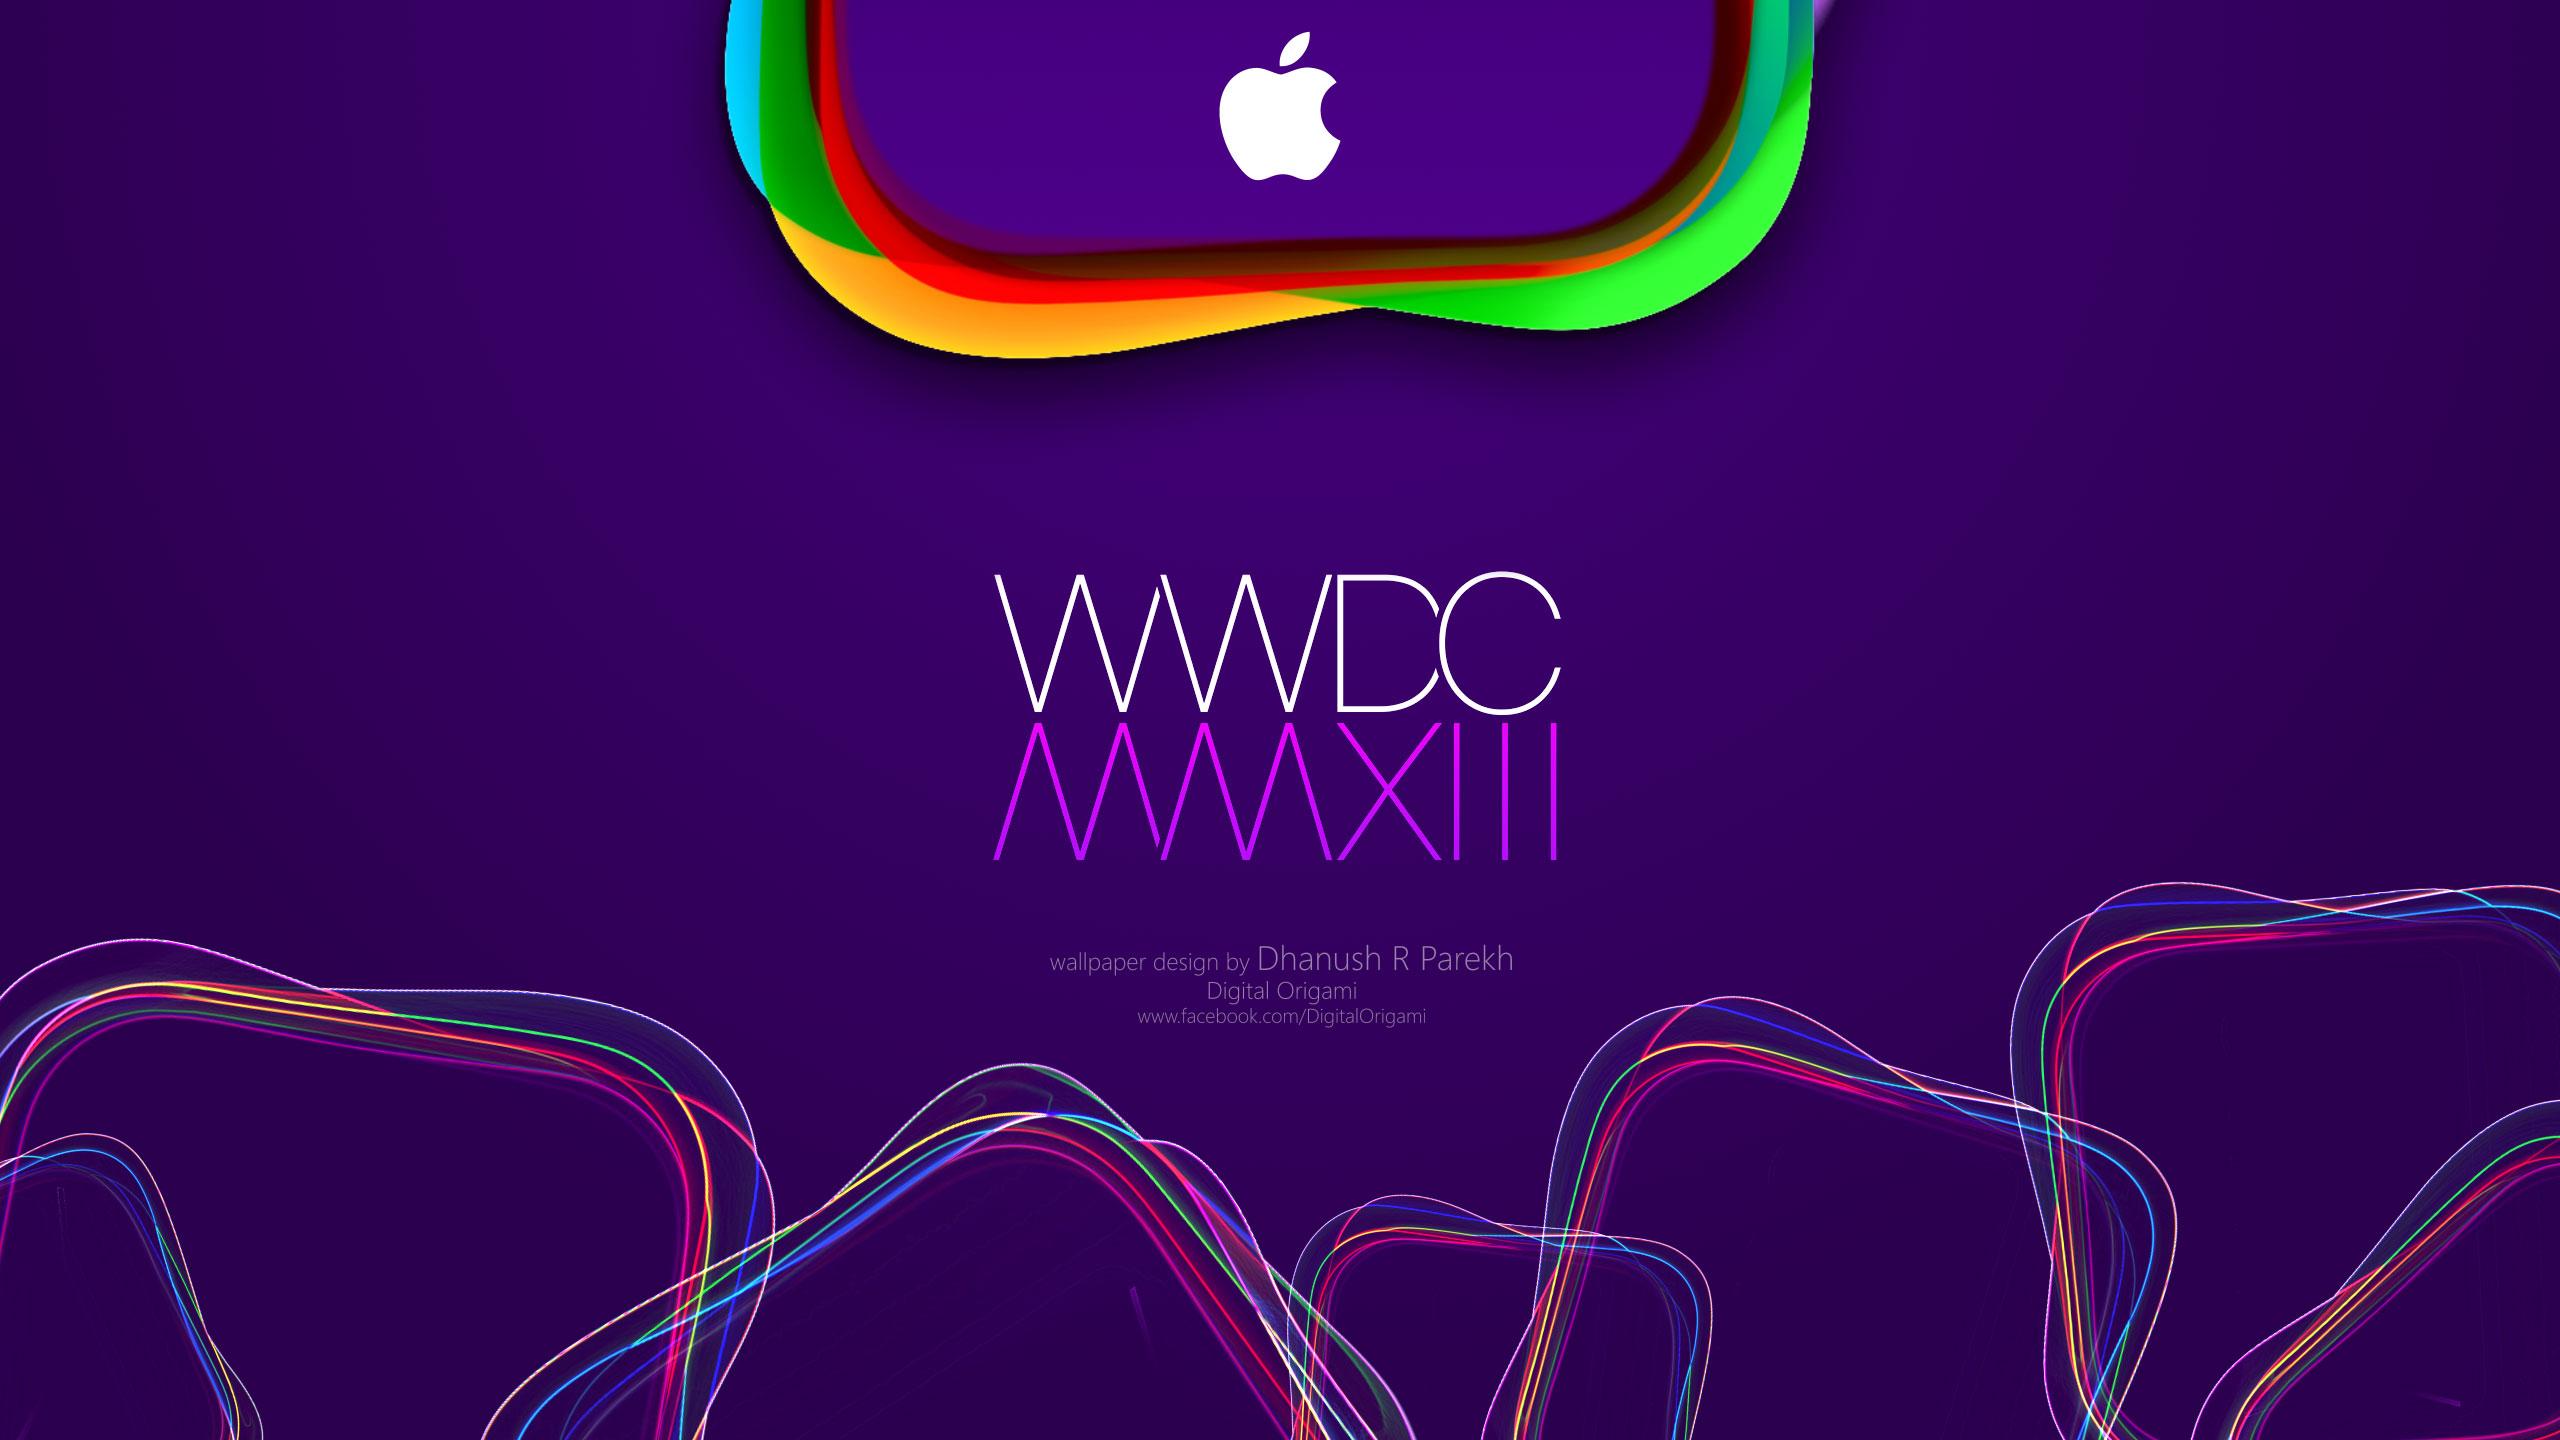 data_news_apple_wwdc_2013_wallpaper_by_dhanushparekh_d62xdhq